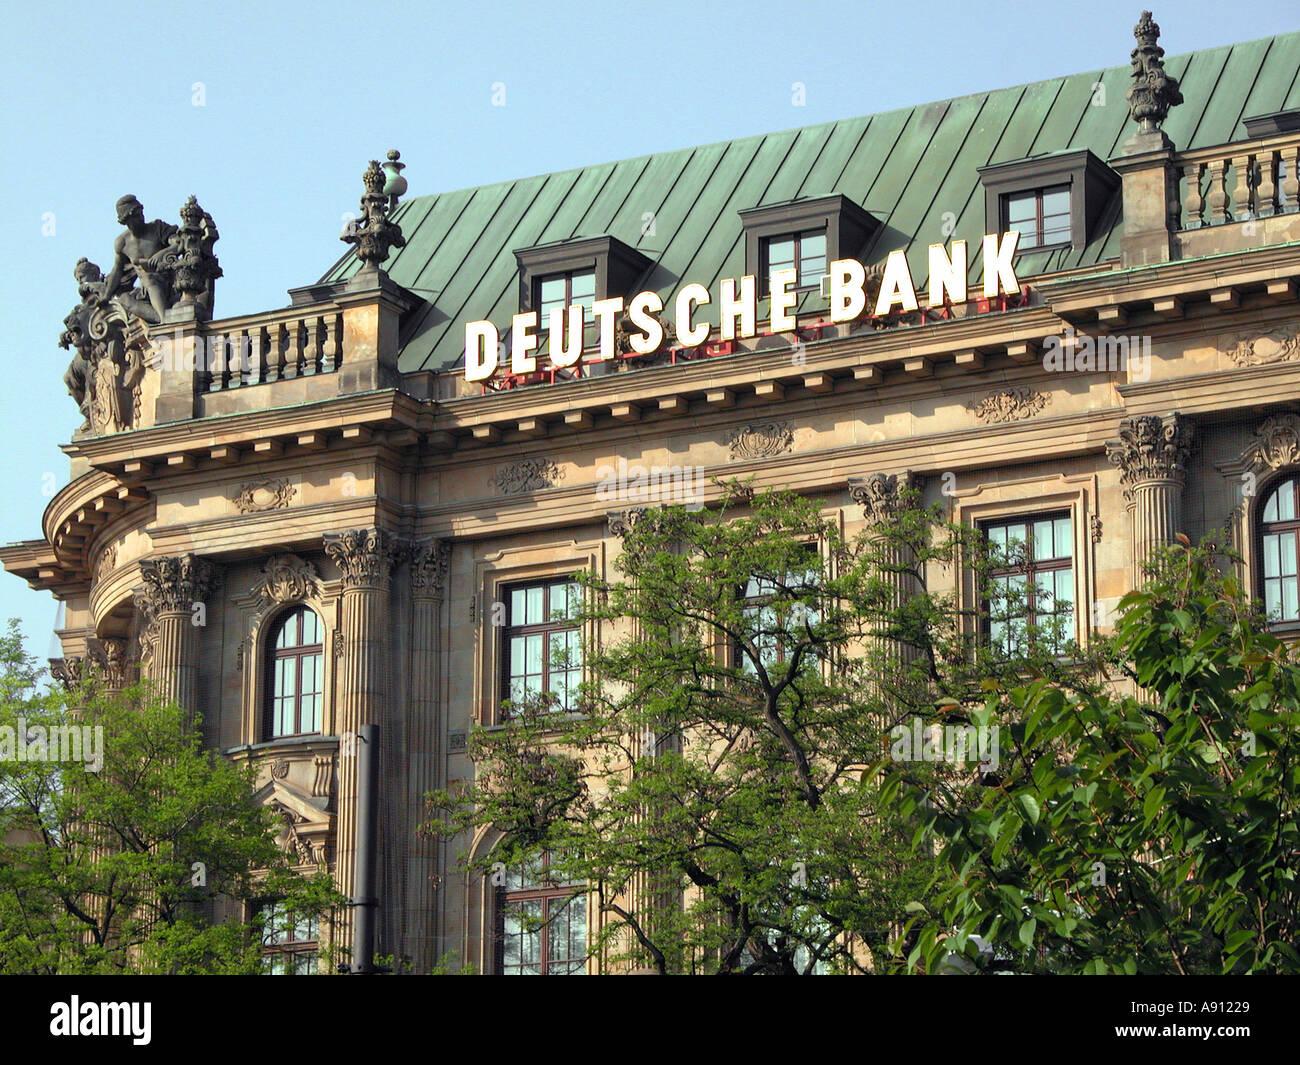 the DEUTSCHE BANK building Munich  - Stock Image